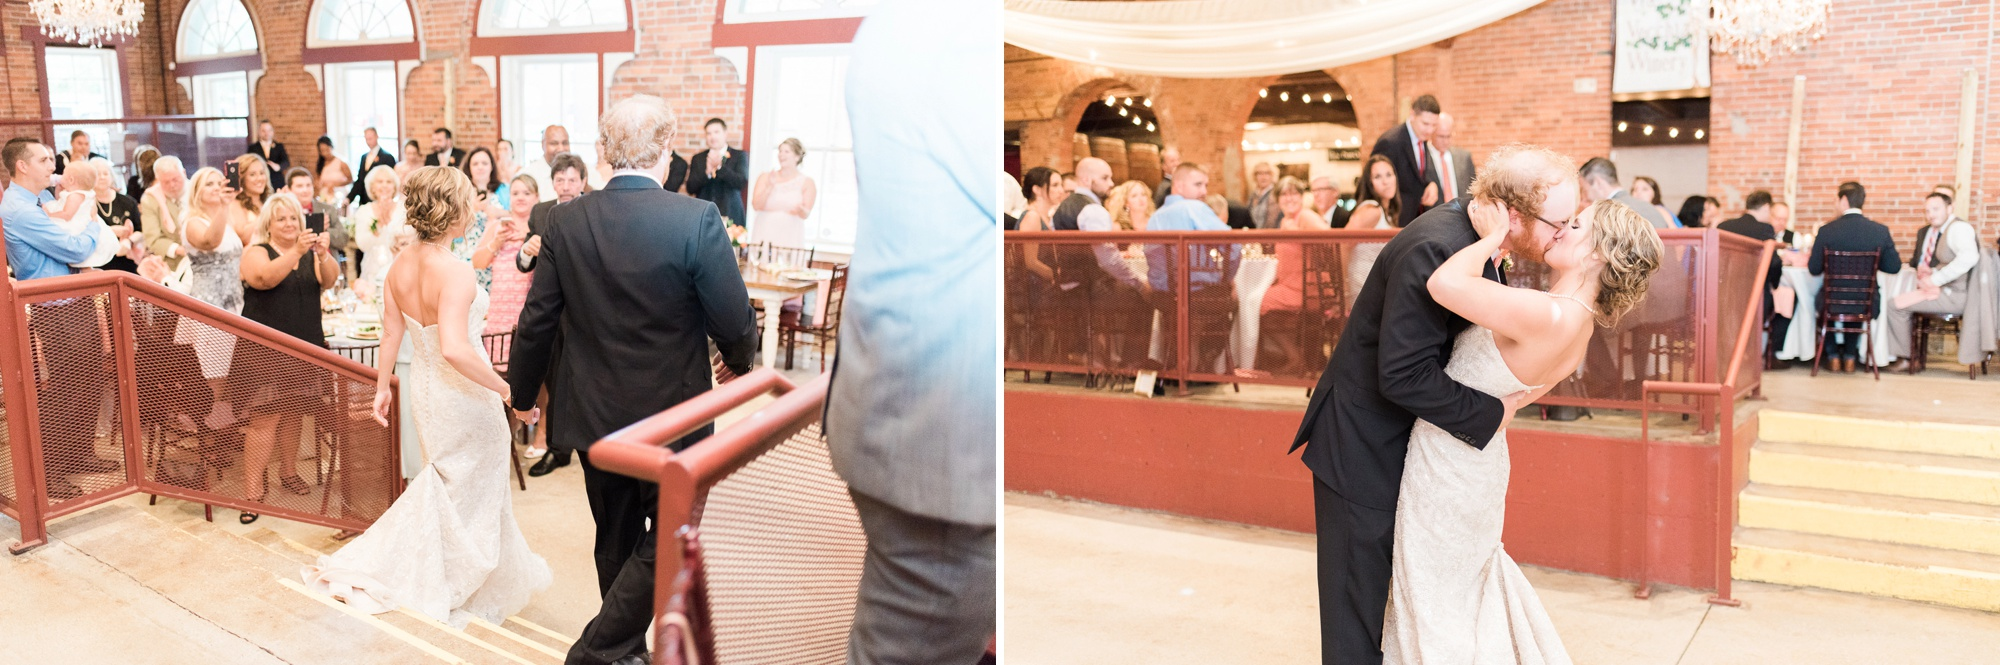 via-vecchia-winery-wedding-columbus-ohio-102.jpg